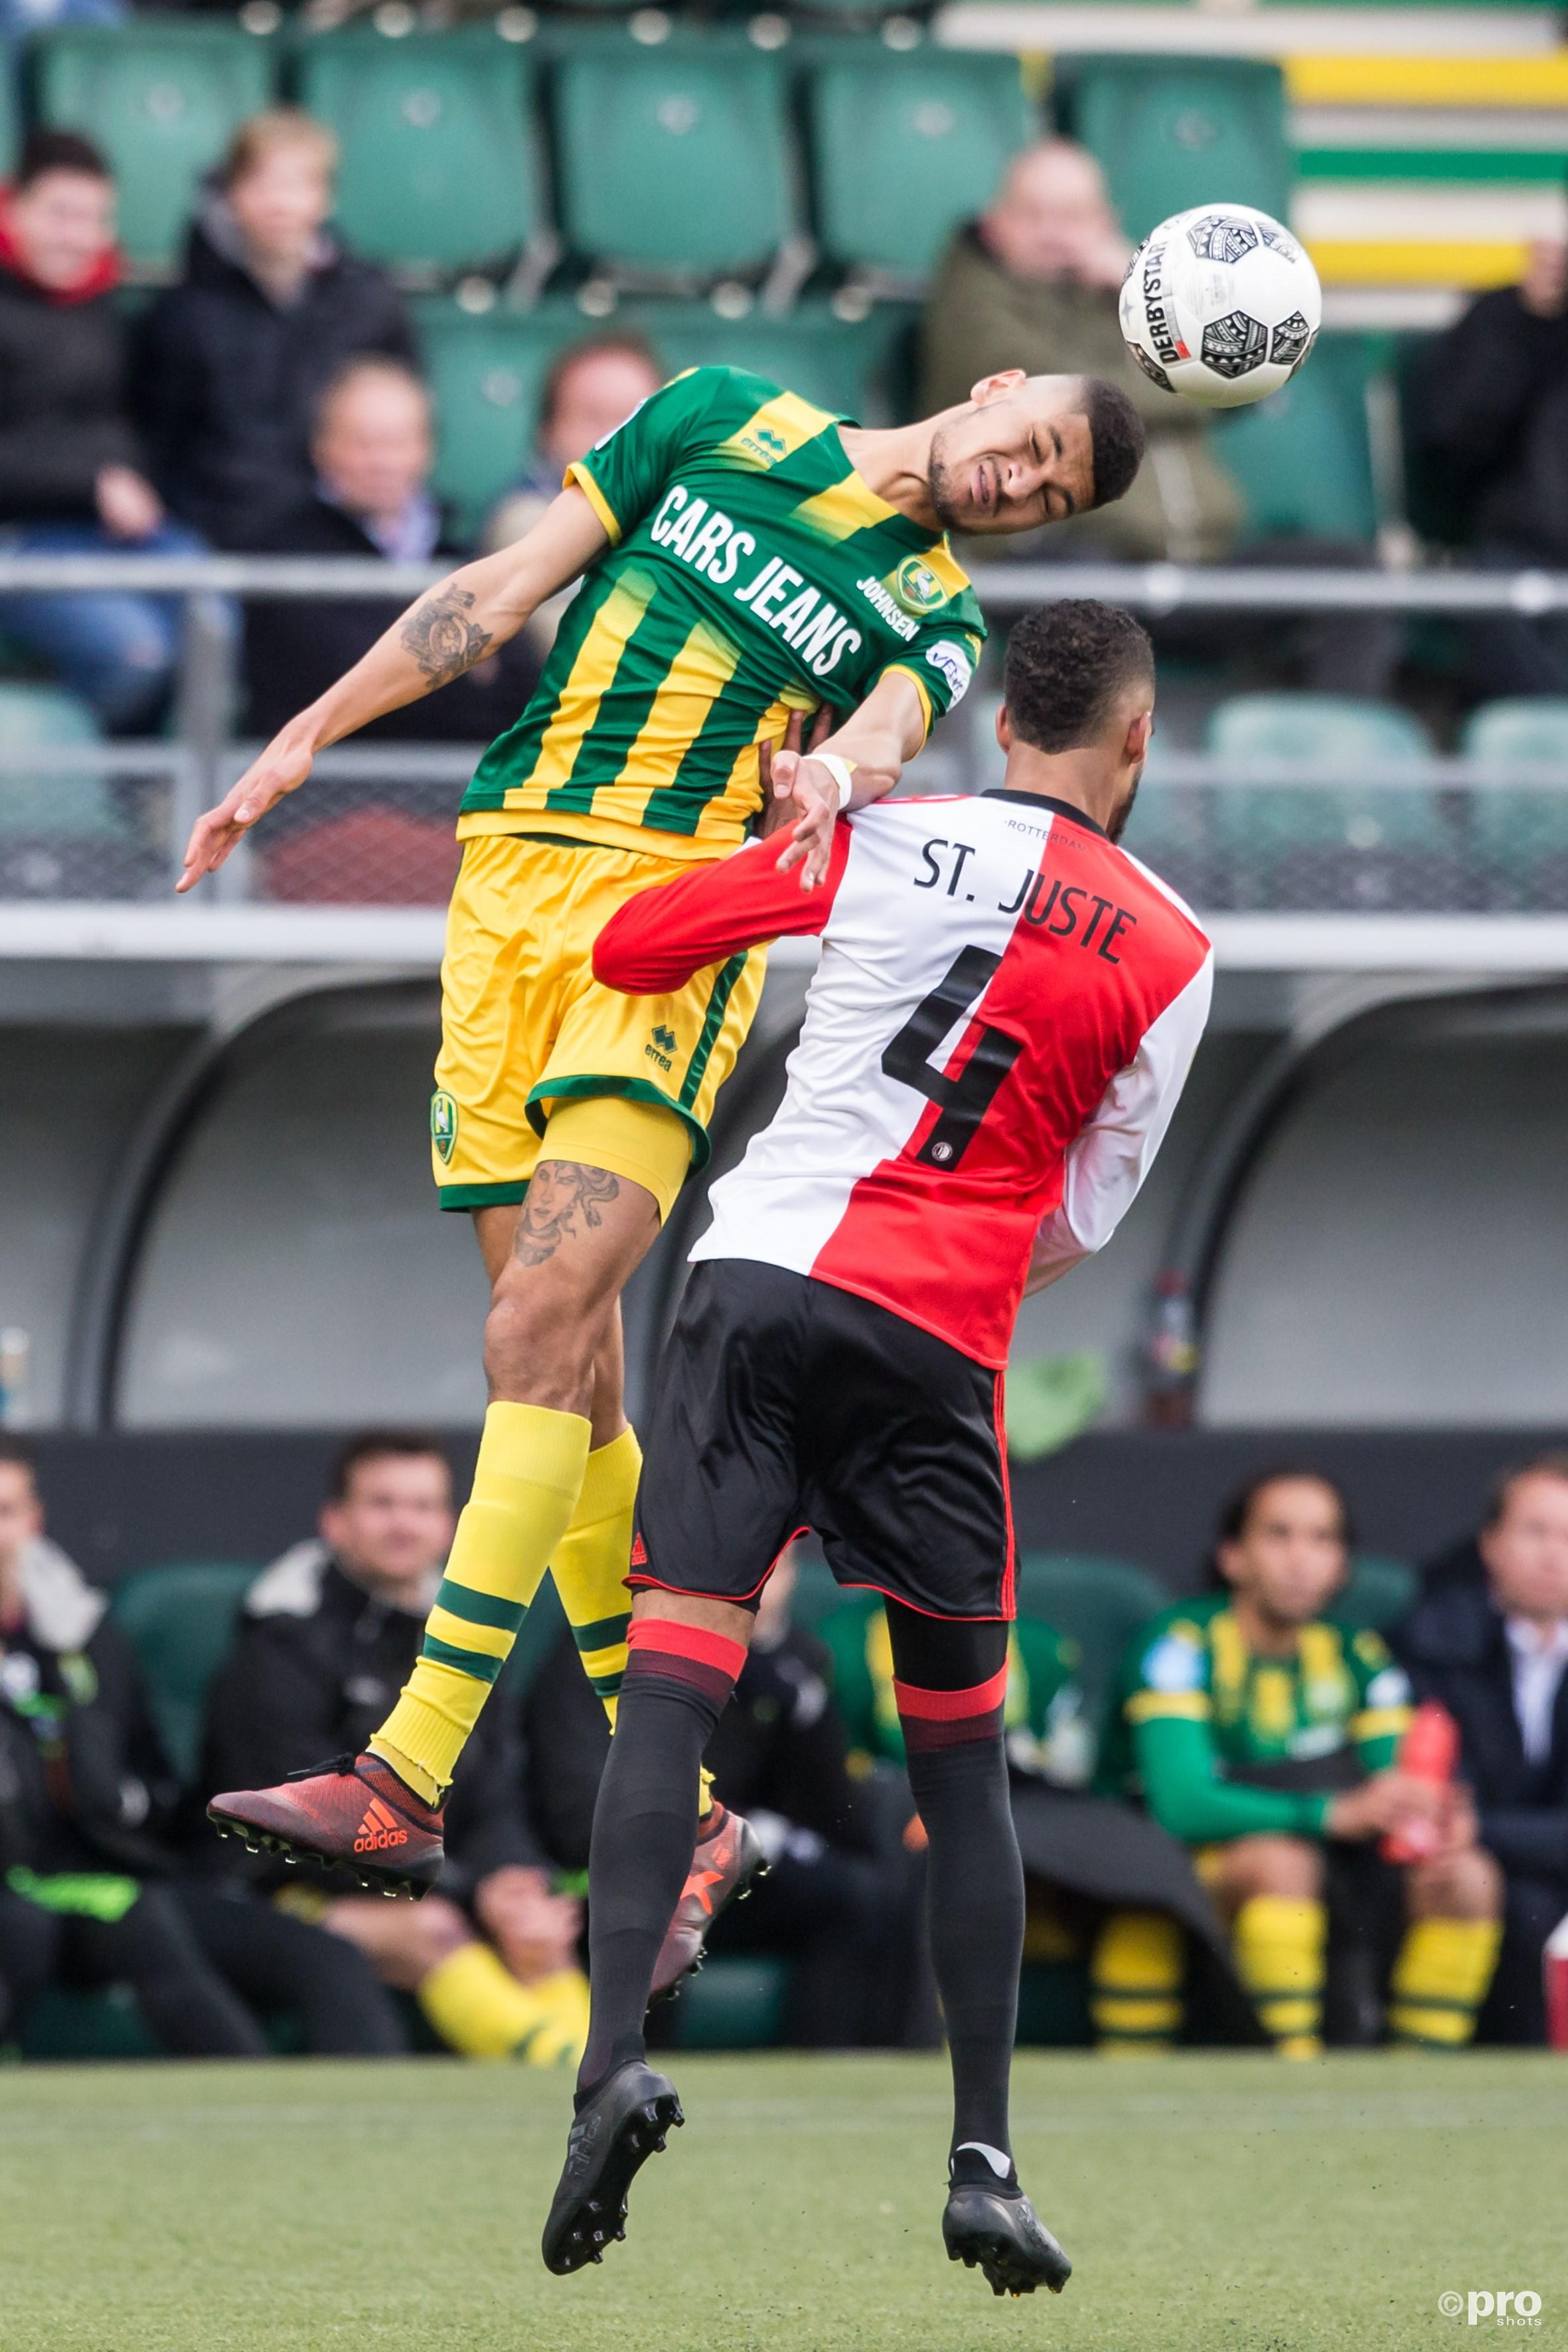 ADO Den Haag speler Bjorn Johnsen (L) in duel met Feyenoord speler Jeremiah st. Juste. (PRO SHOTS/Marcel Bonte)